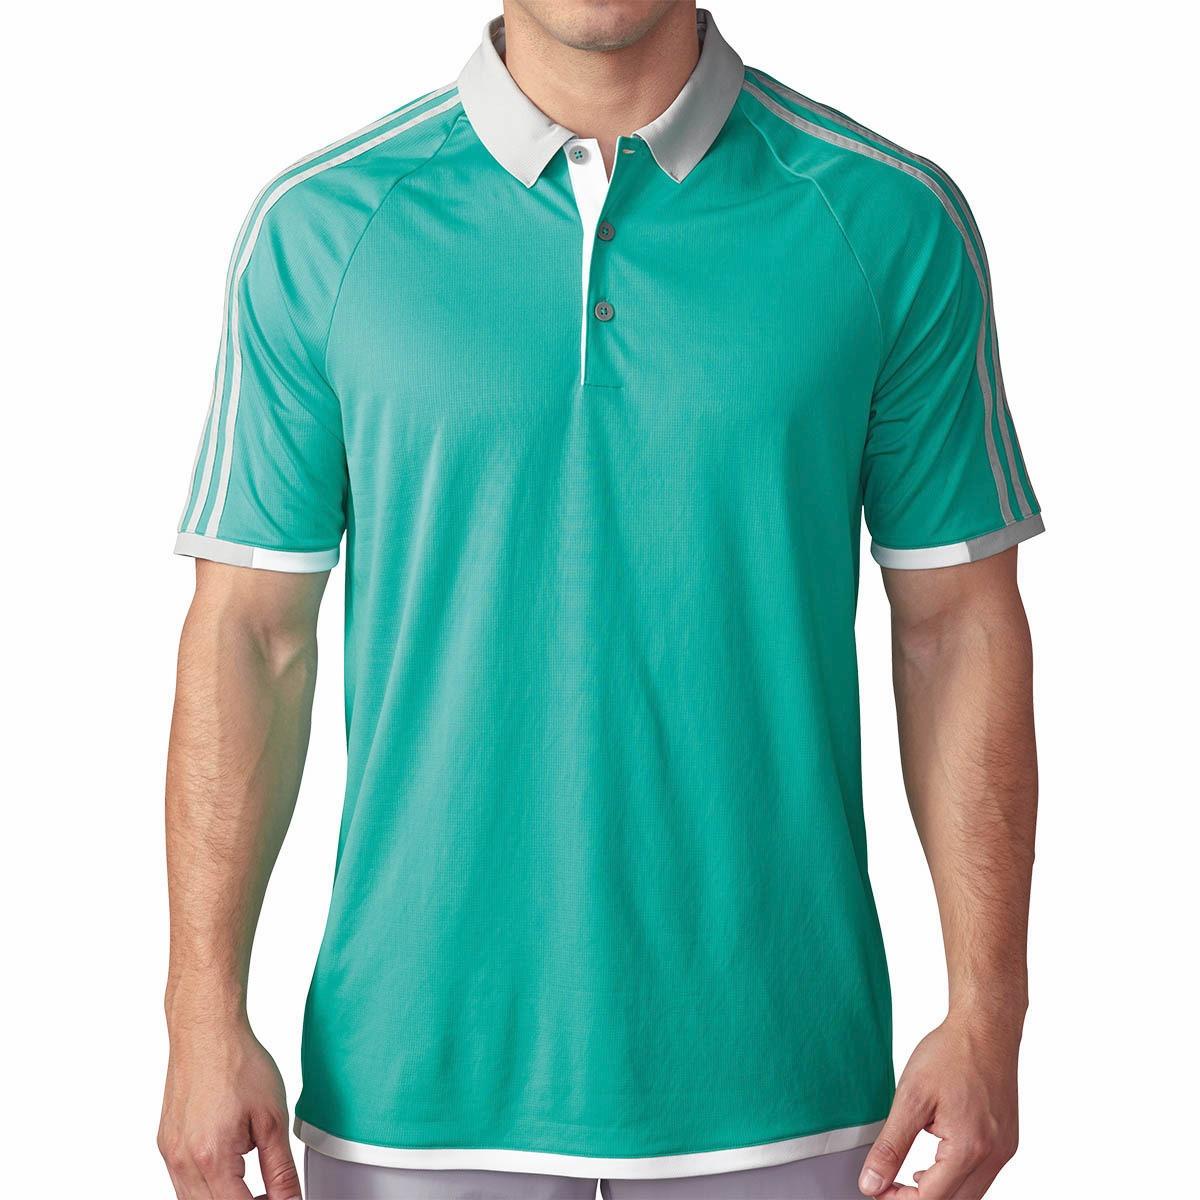 adidas polo golf shirts